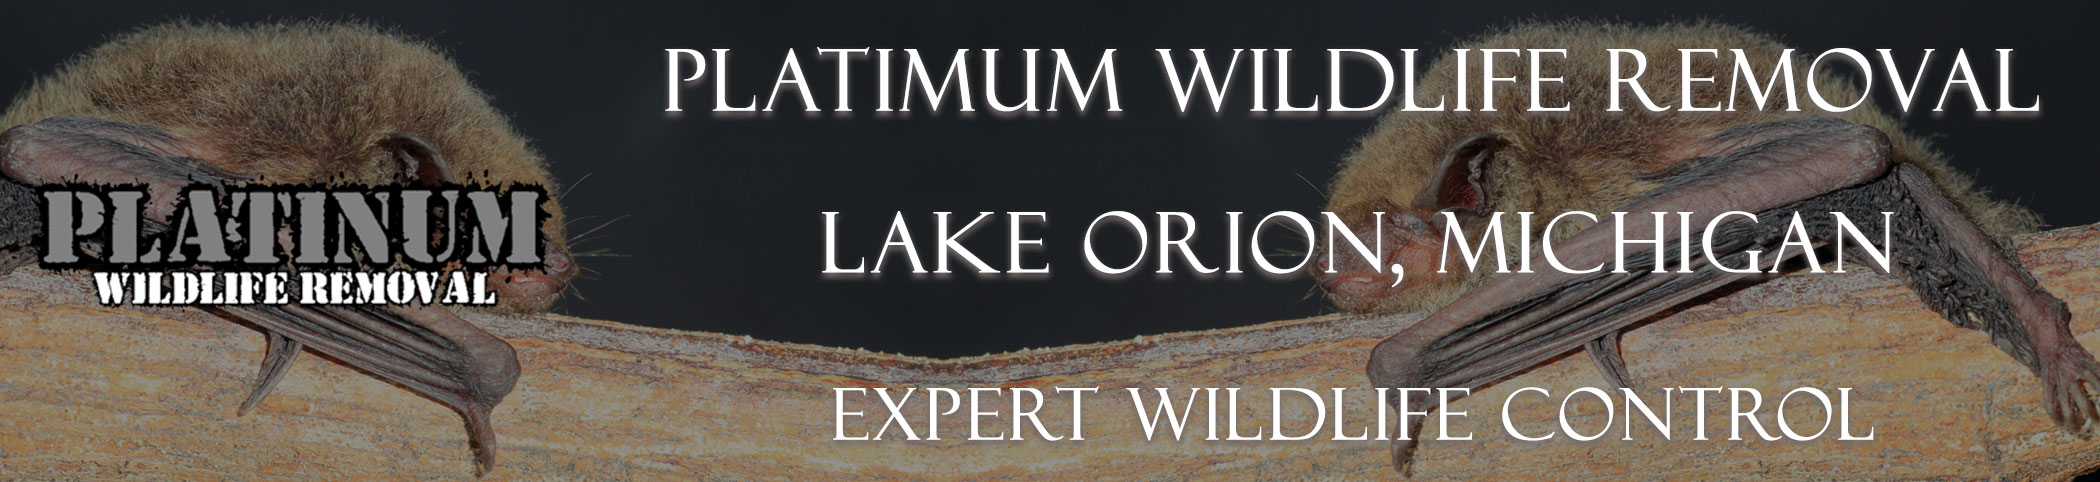 Lake-Orion-Platinum-Wildlife-Removal-michgan